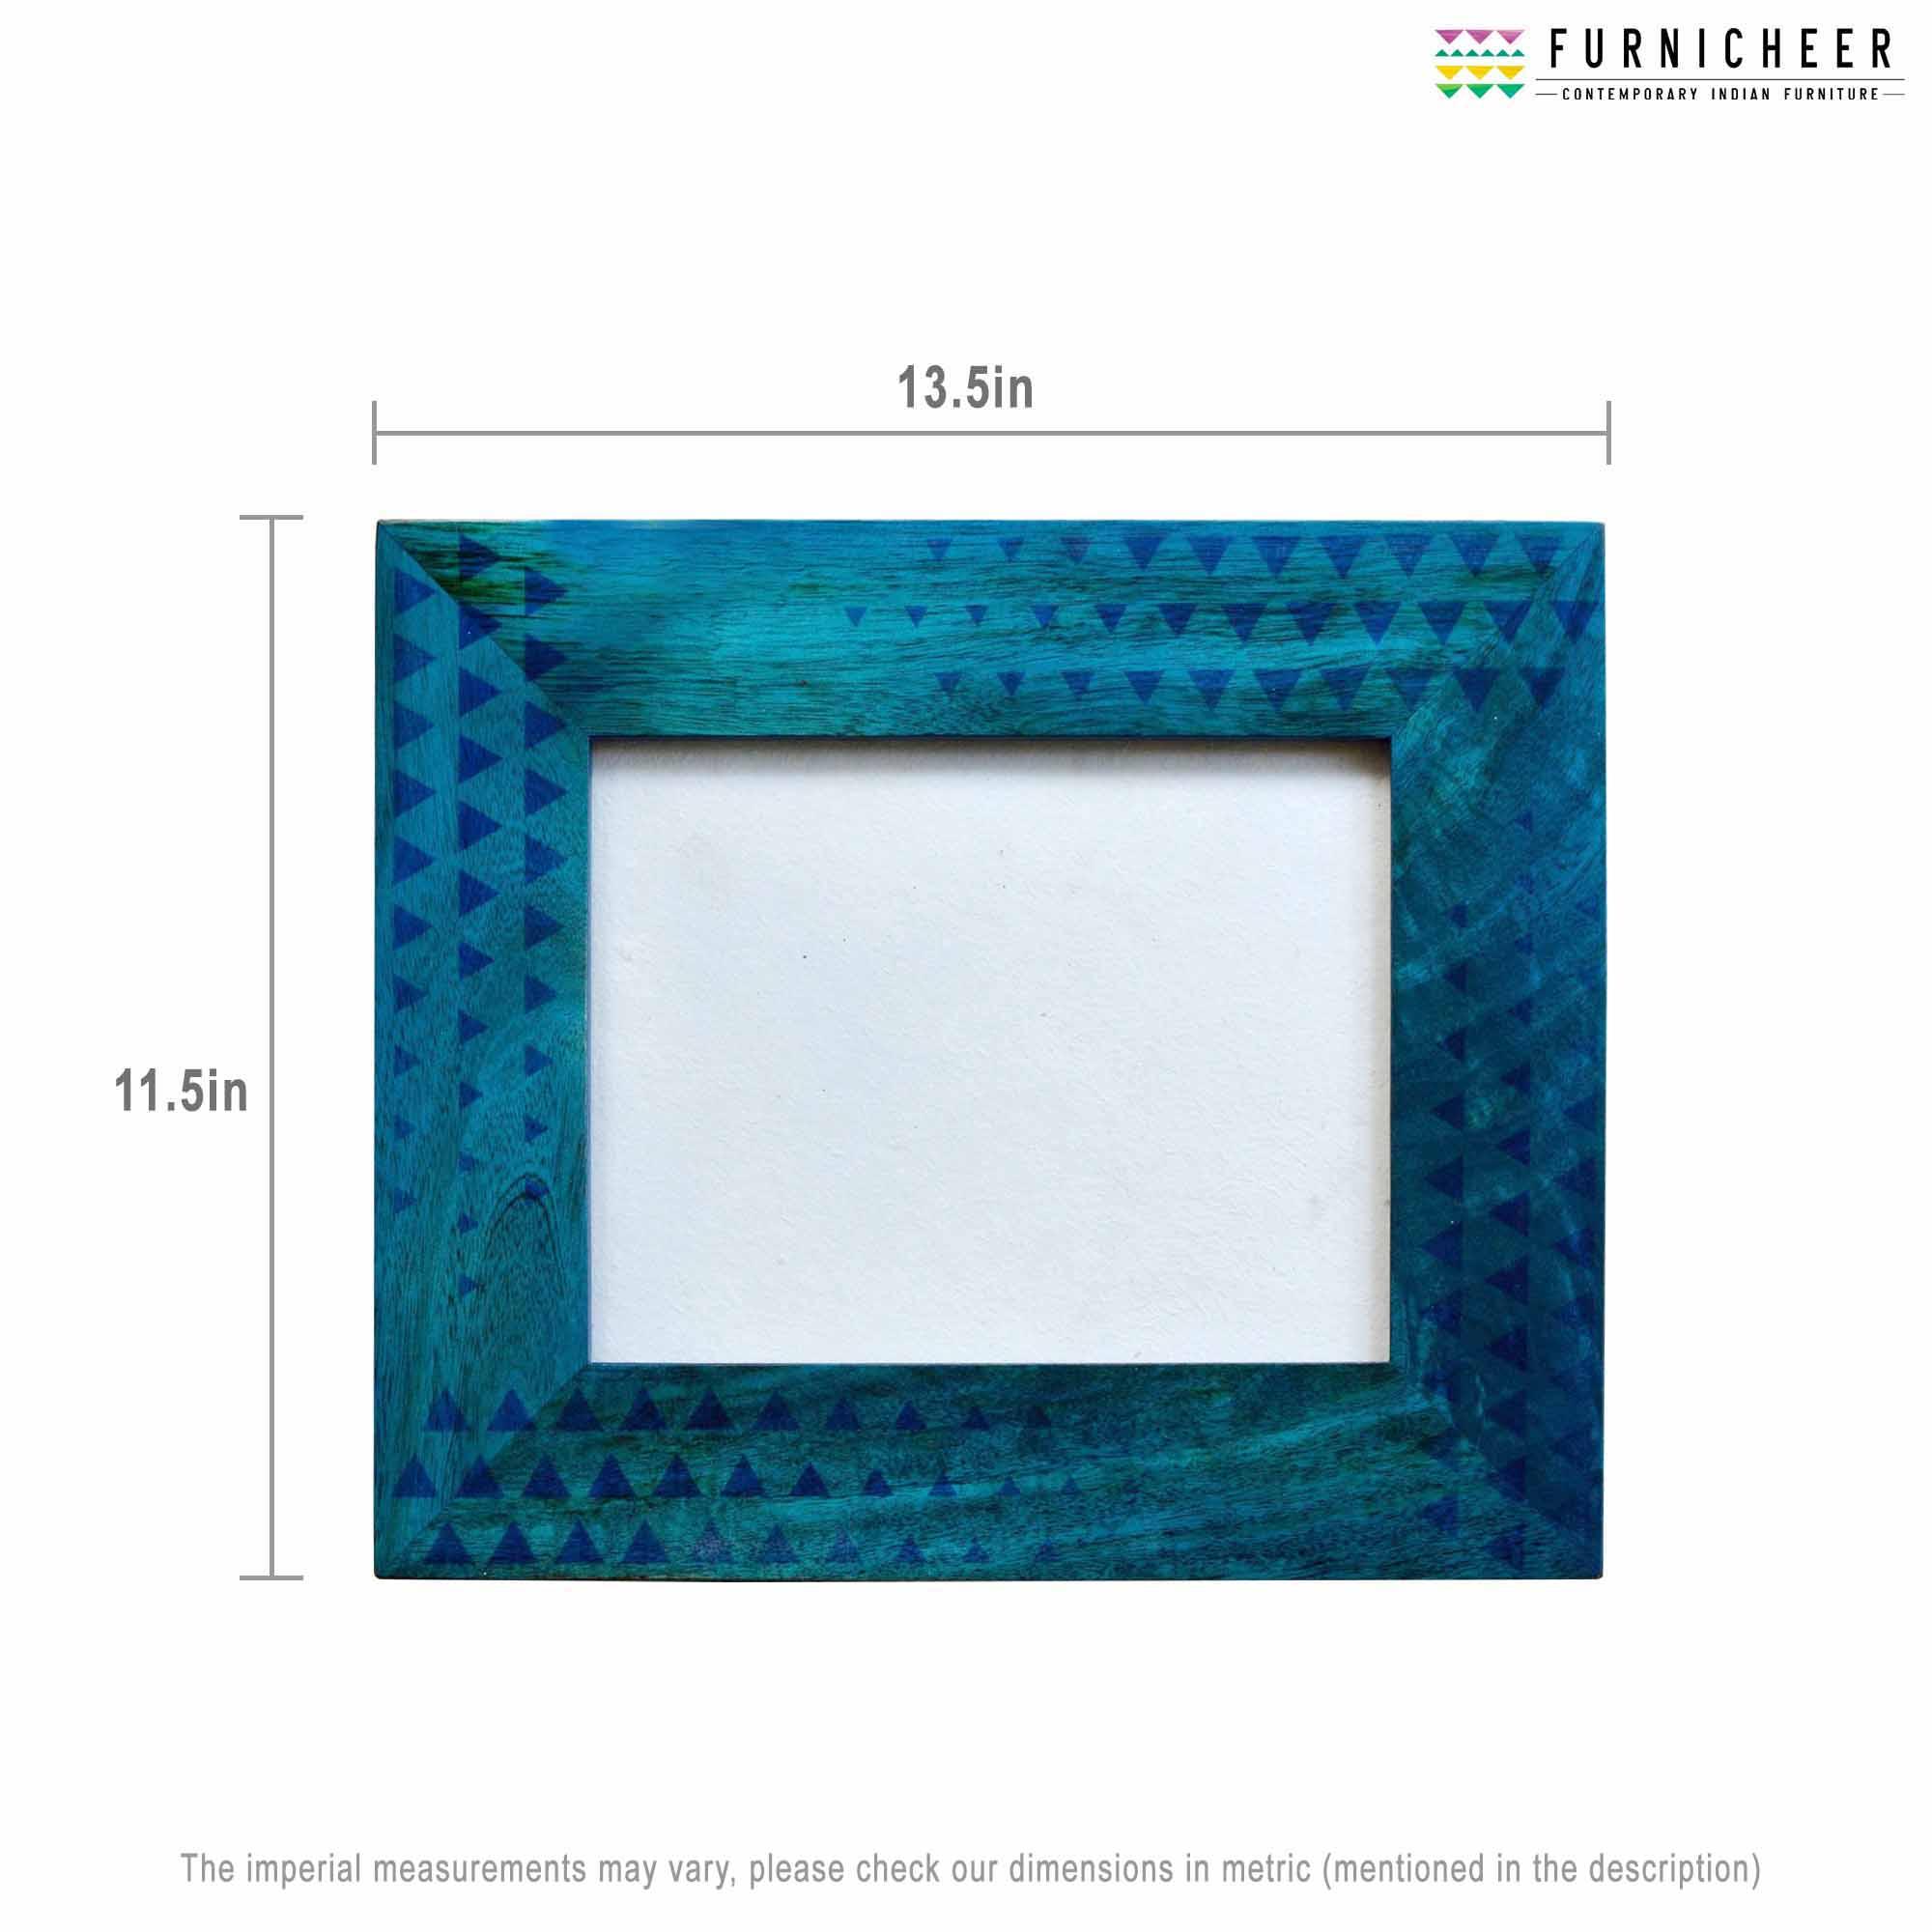 2.SERIGRAPH FRAME PFTM0026